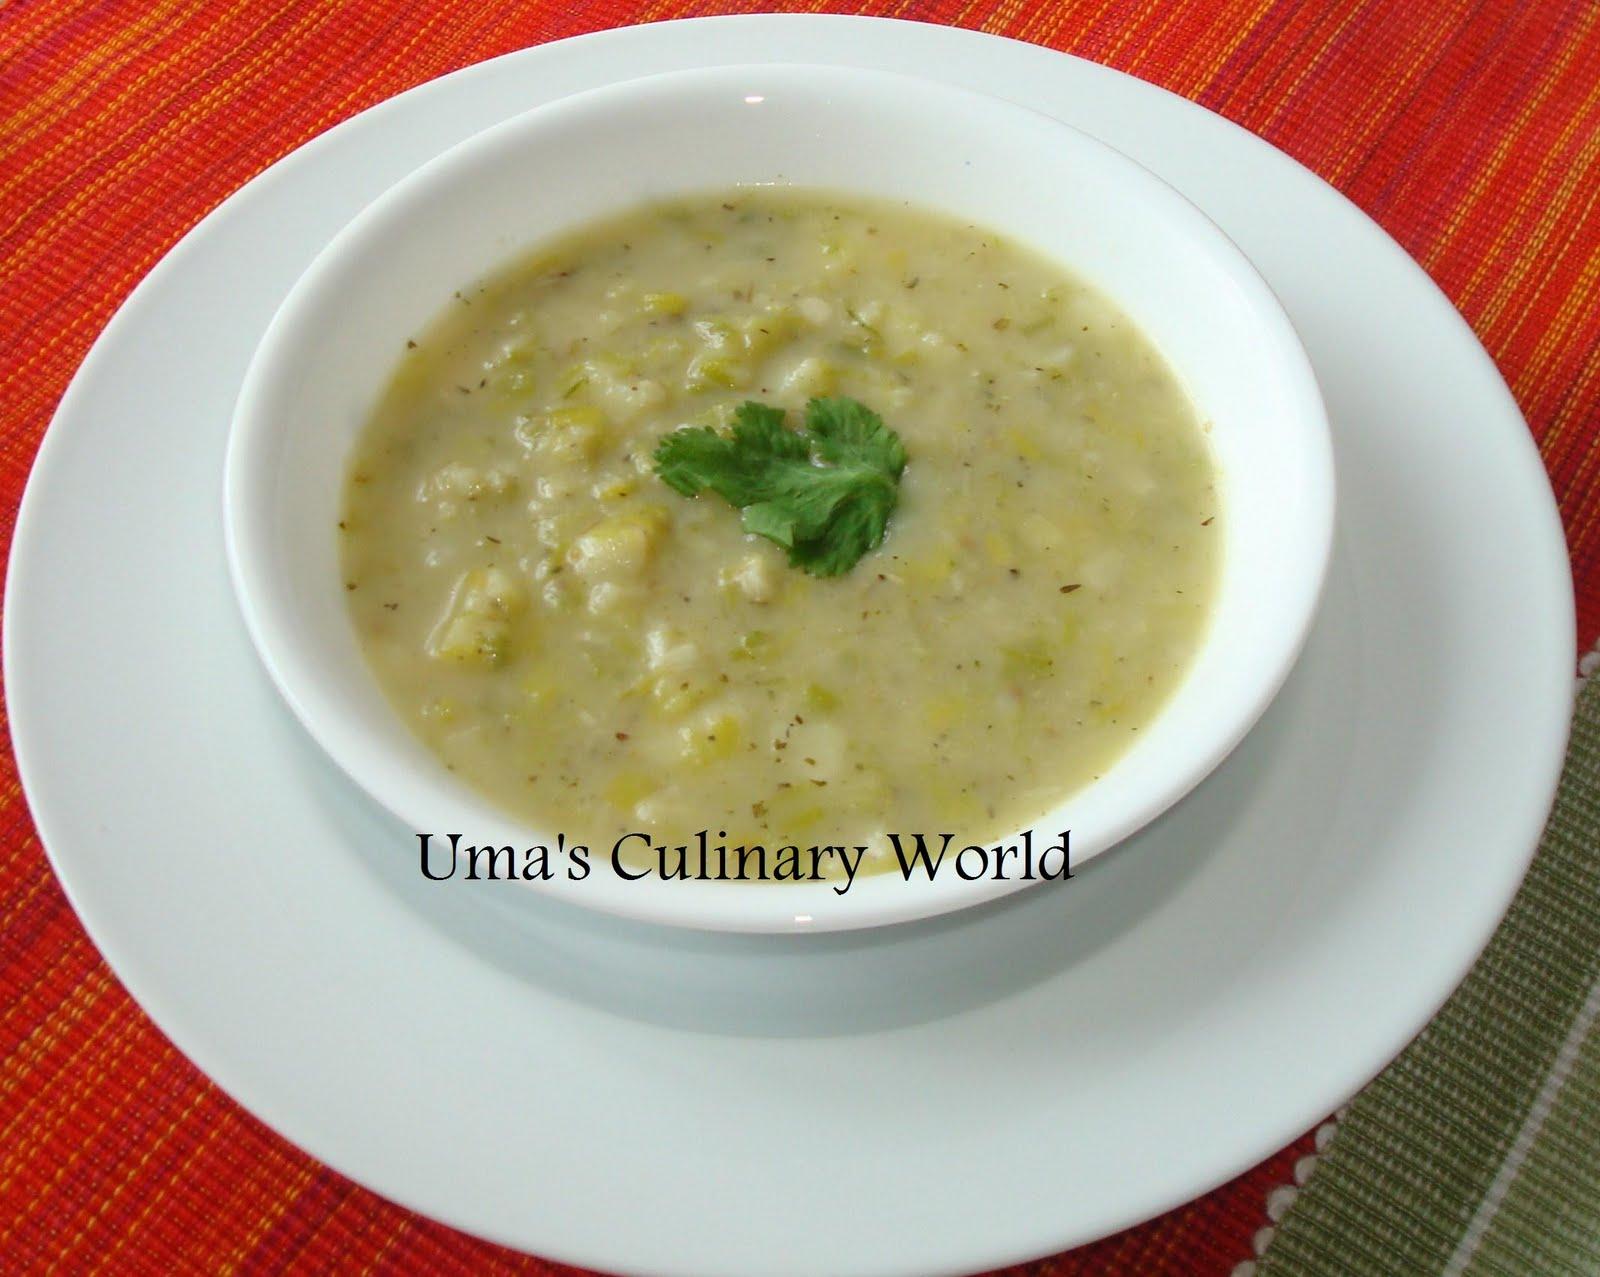 Creamy potato soup with leeks seasoned with Italian herbs.